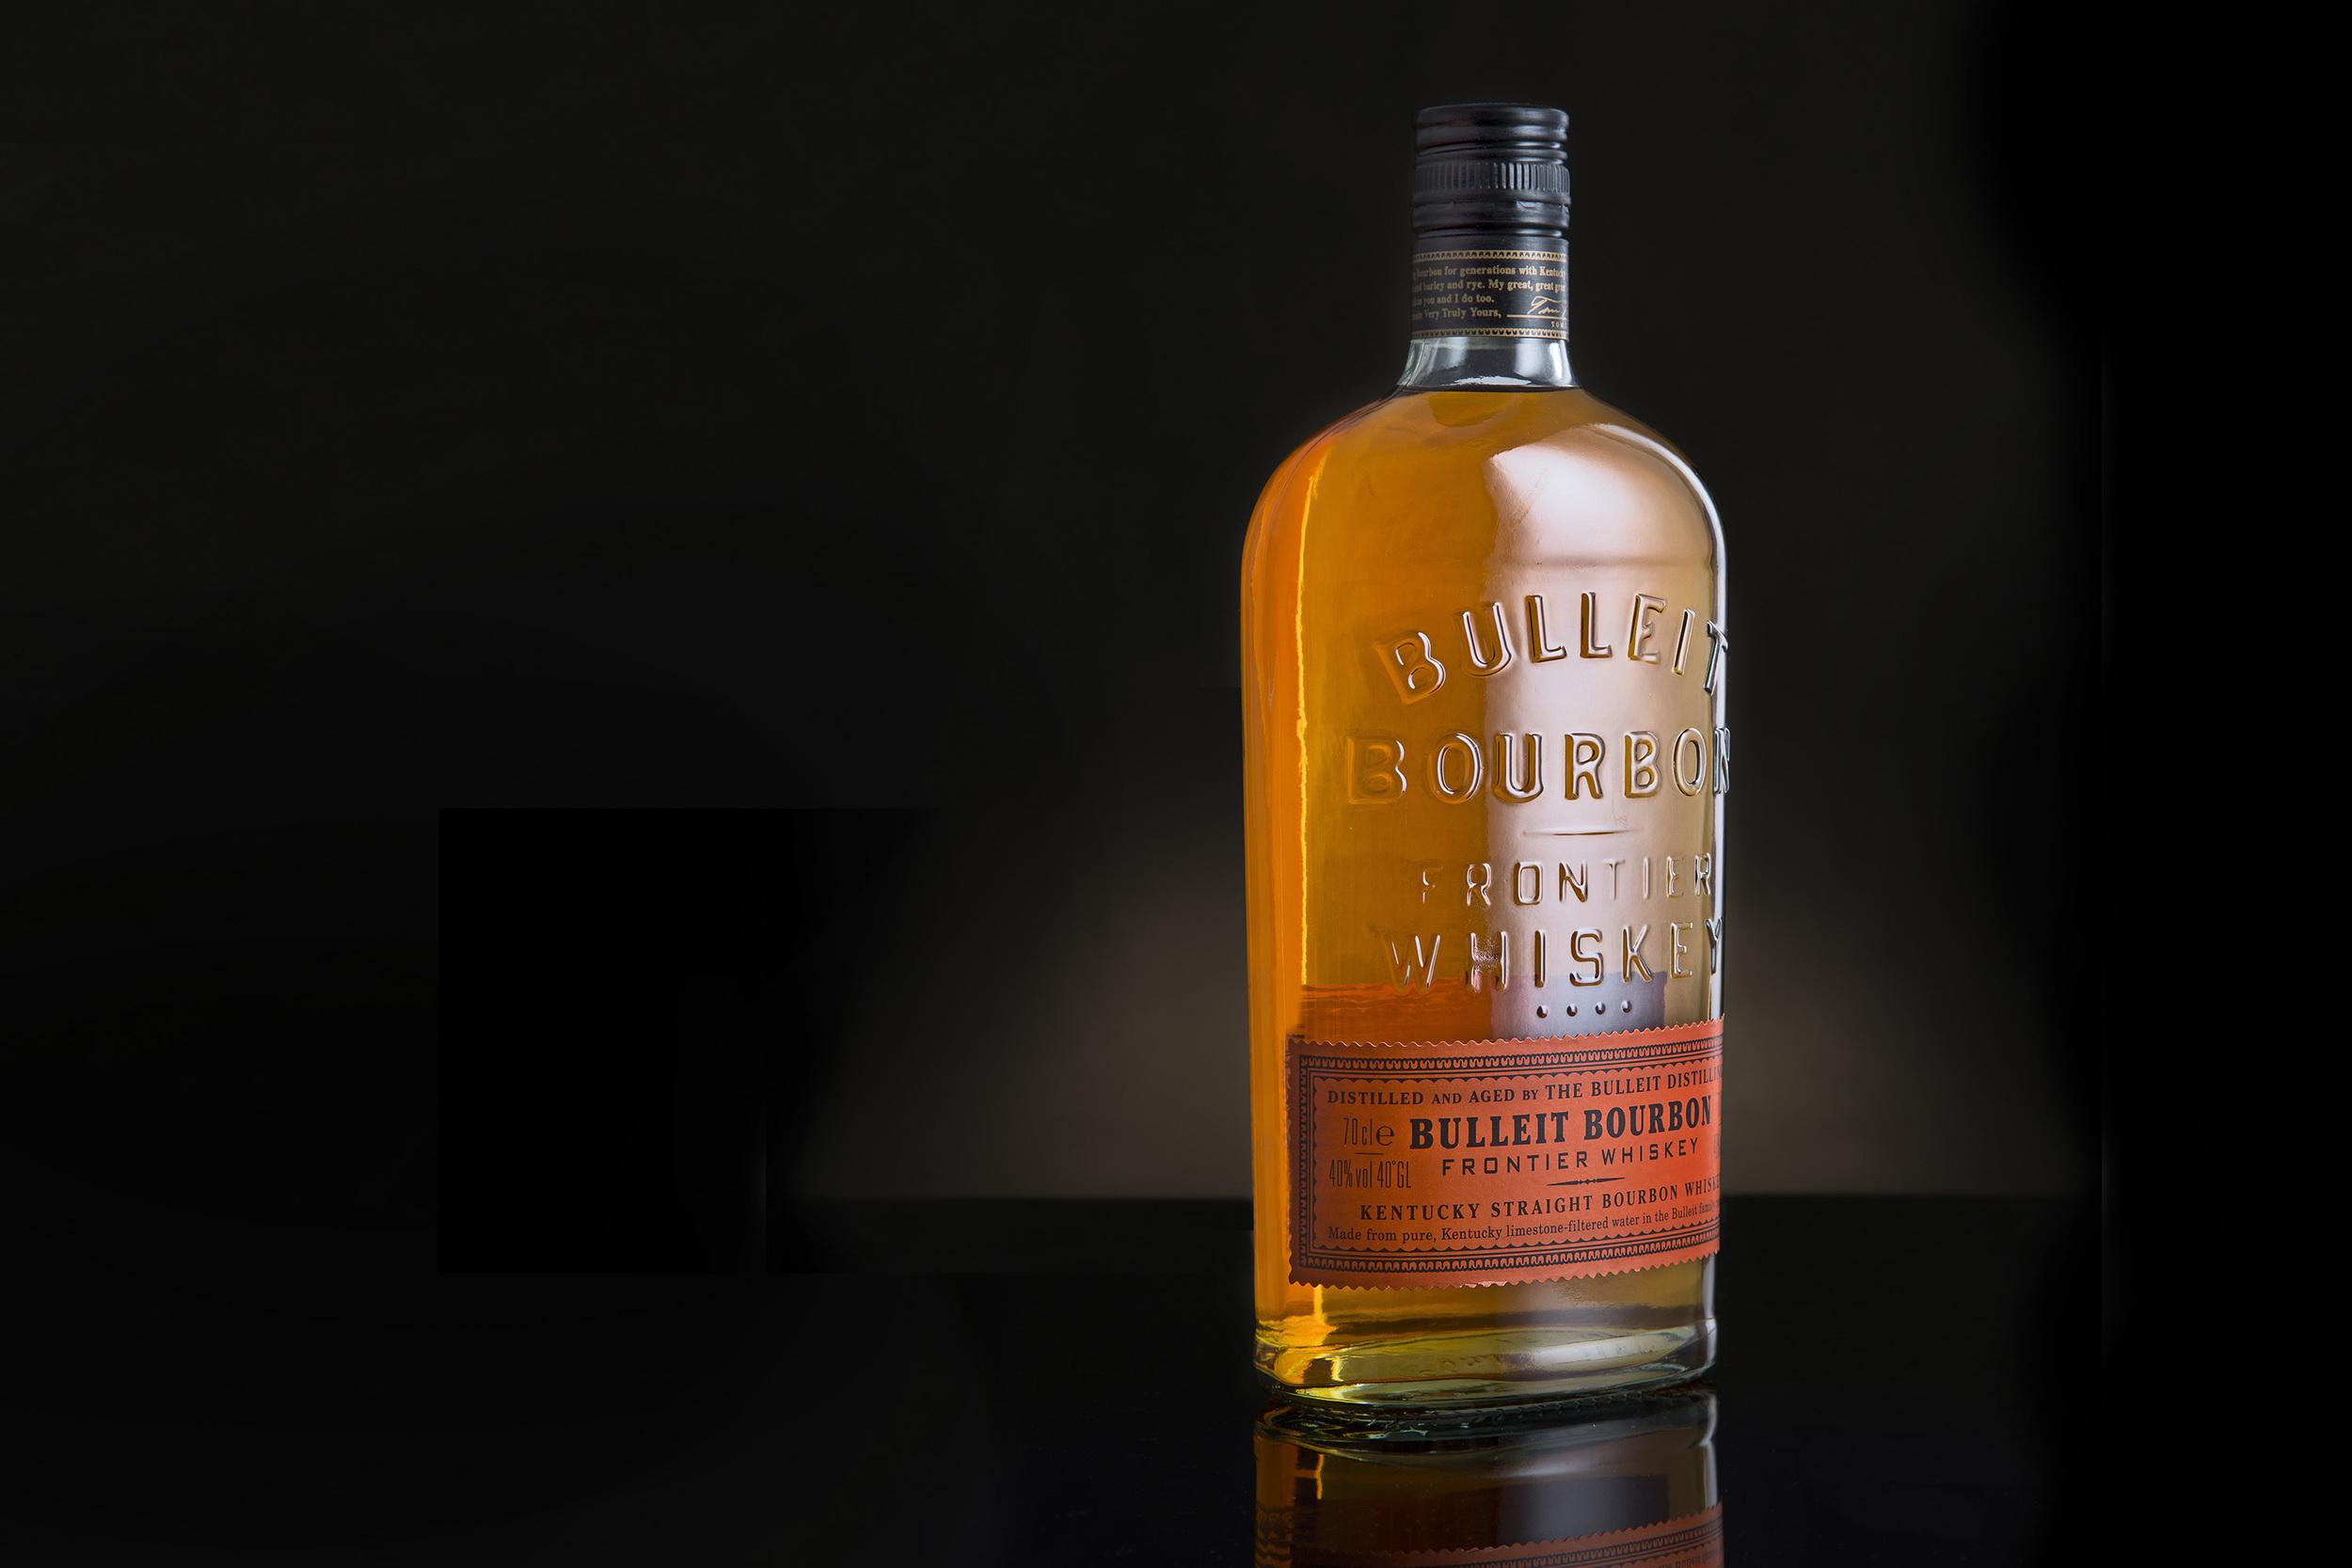 Bourbon02colour-small.jpg